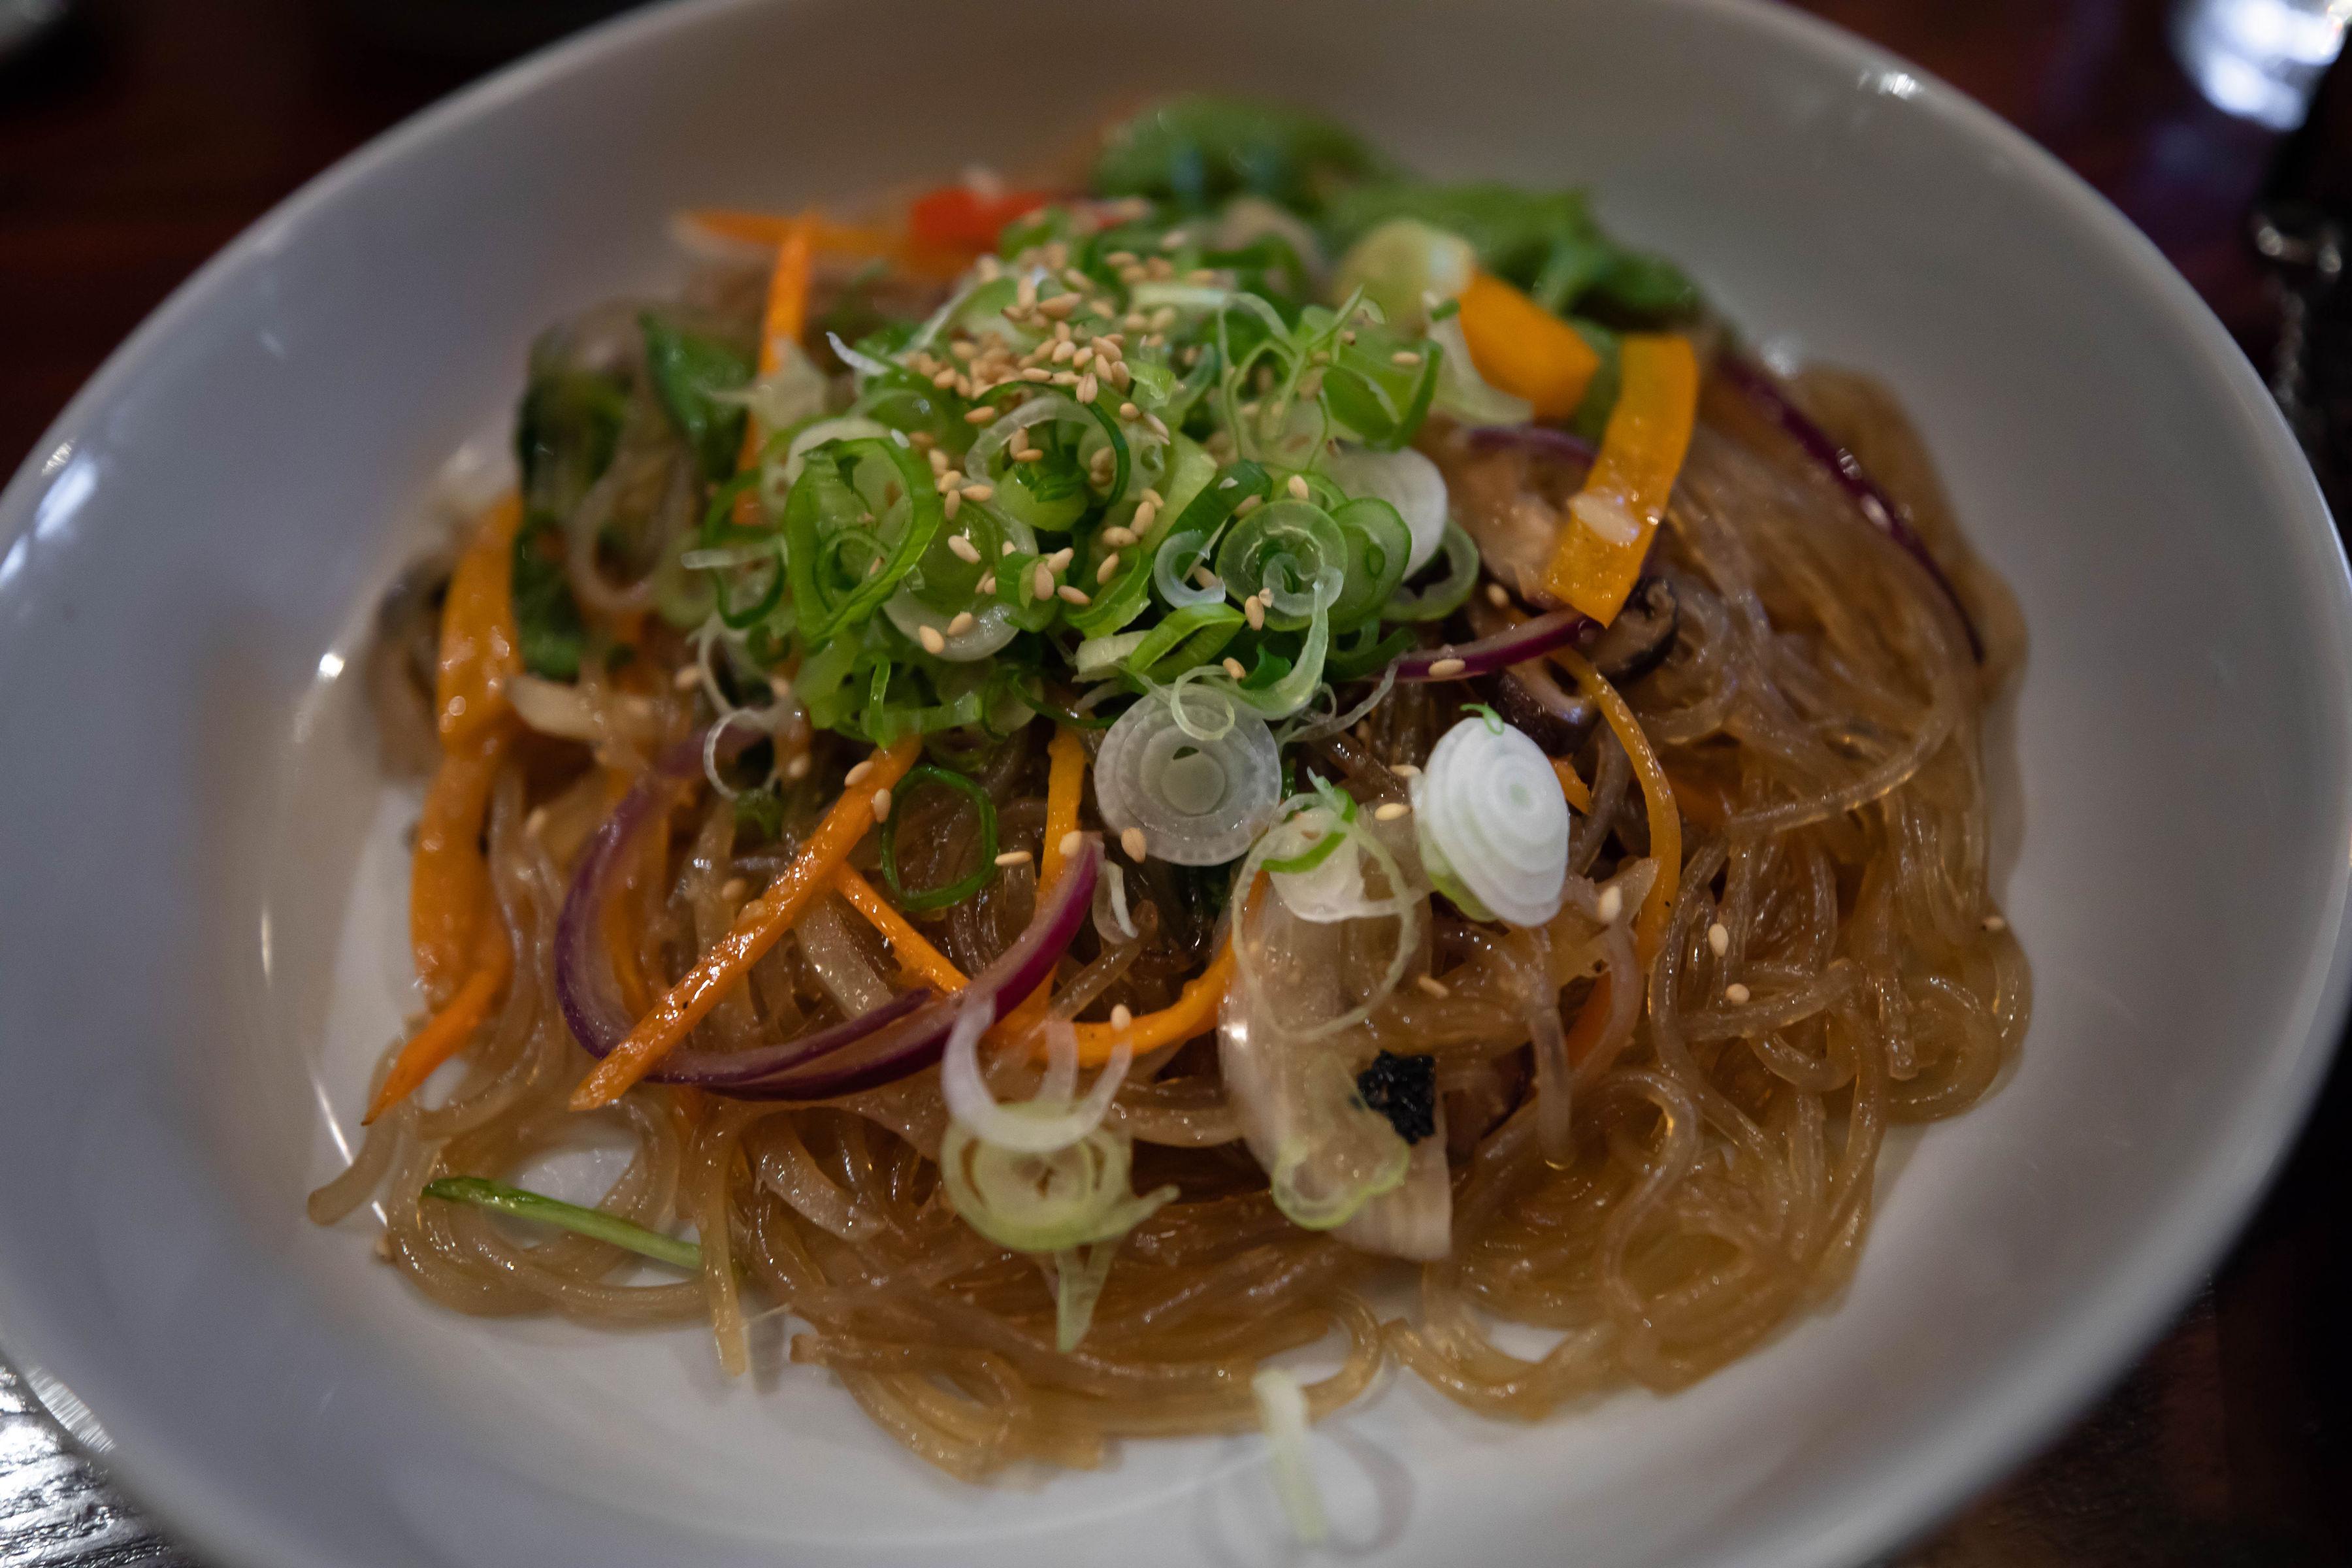 Itadakizen Vegan Organic Japanese Restaurant in London England